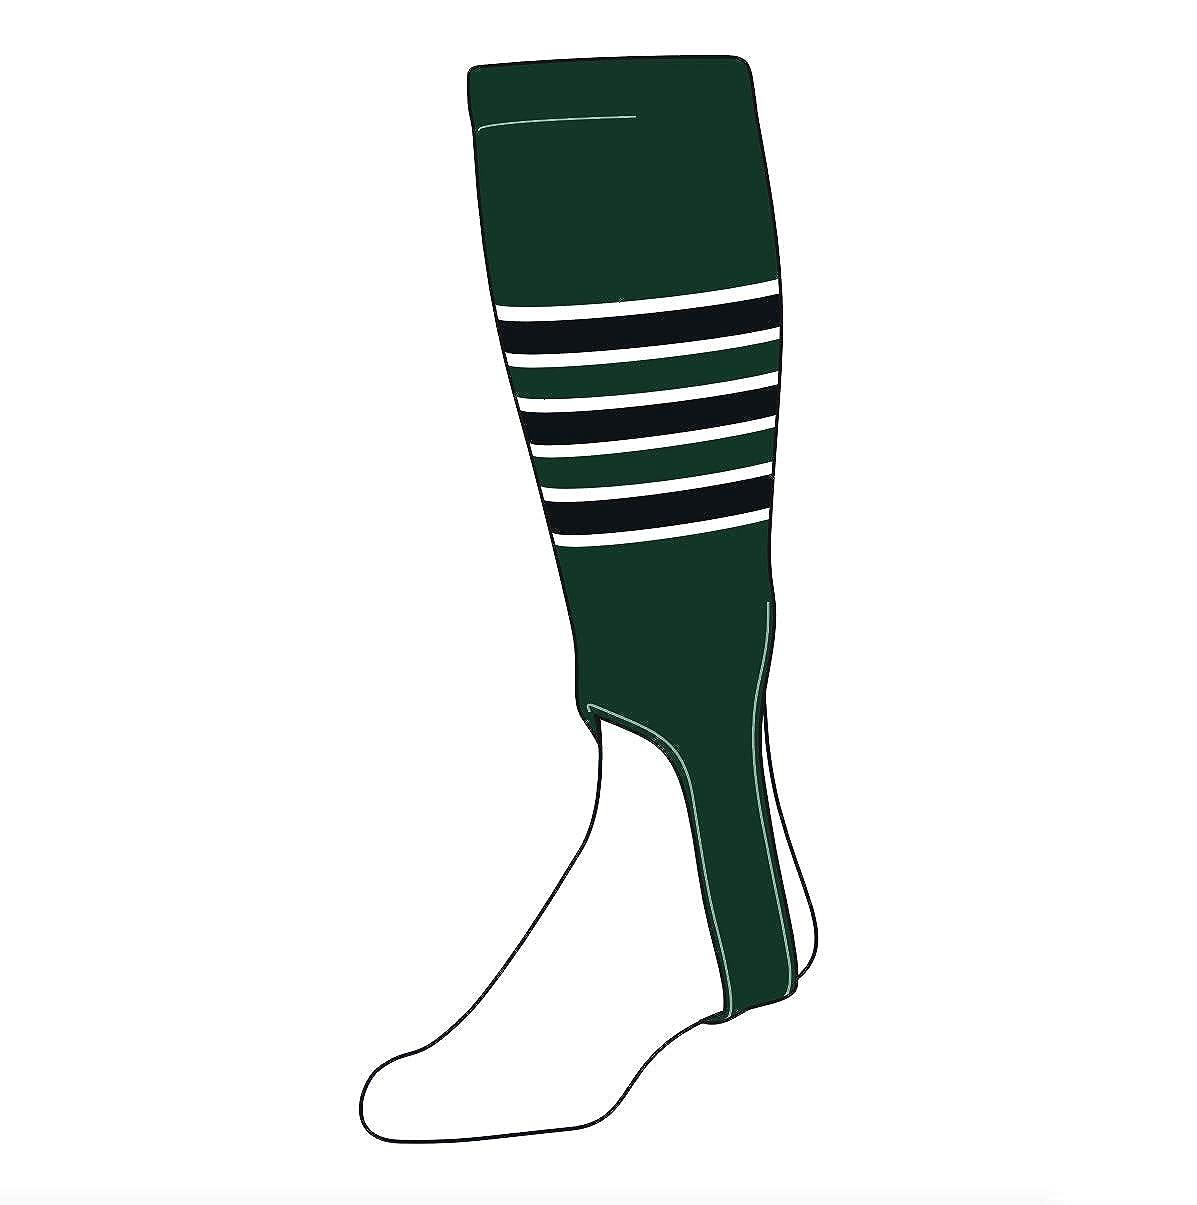 TCK Socks メンズ SOCKSHOSIERY メンズ US サイズ: years) Large Socks 19 inch (16+ years) B07MVM5C7Q, HIROMI TAKEI:a35bfcbf --- cgt-tbc.fr